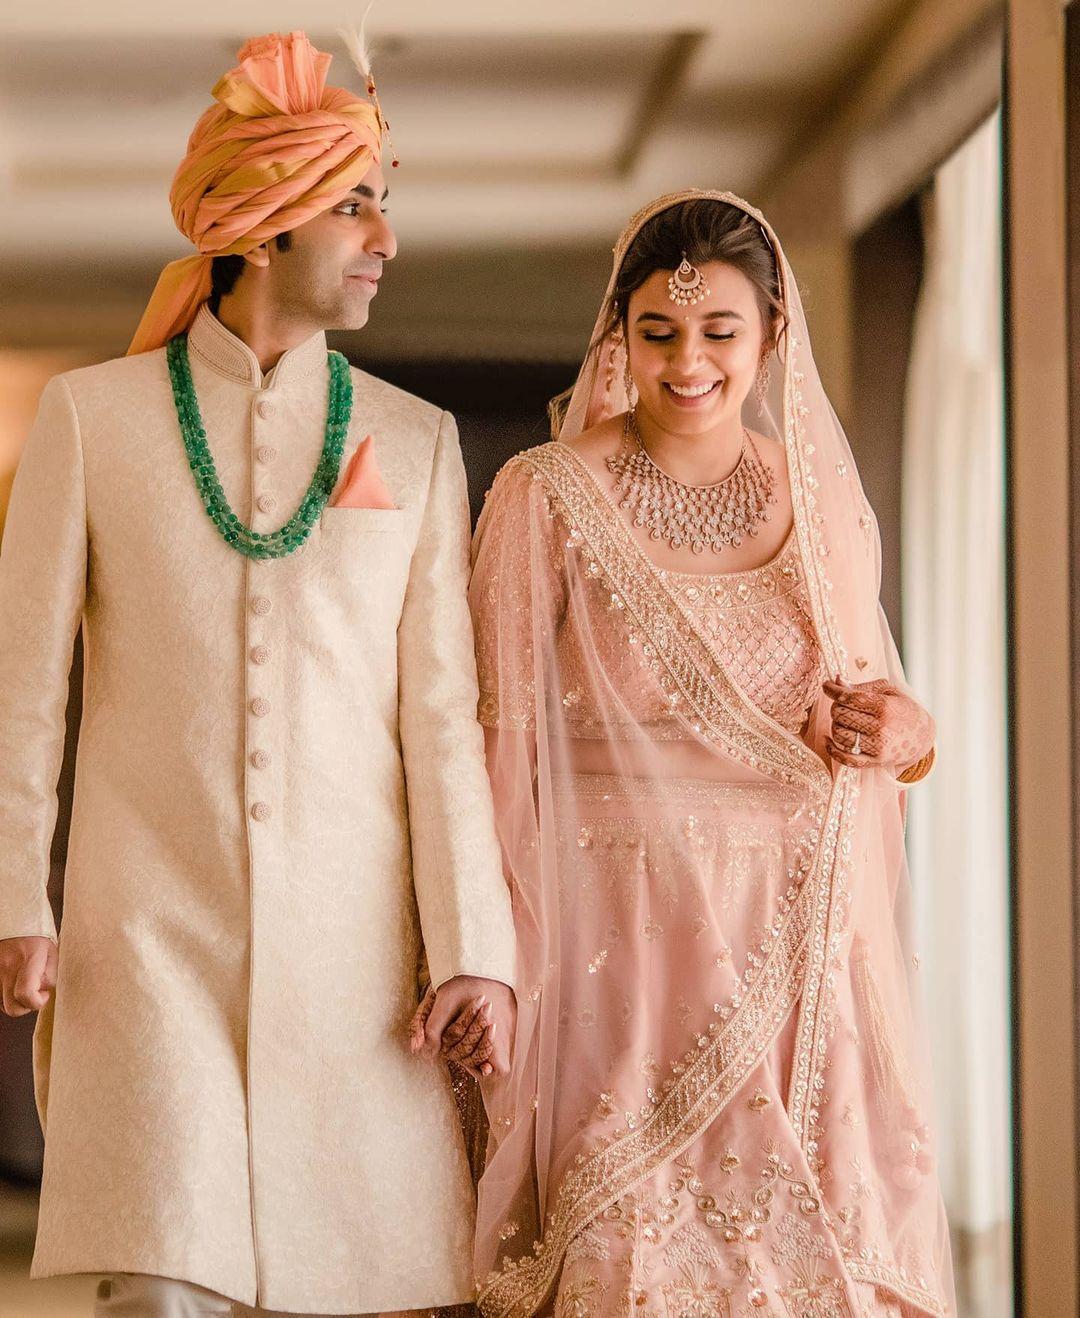 Matching pastel wedding outfits Pankaj Advani